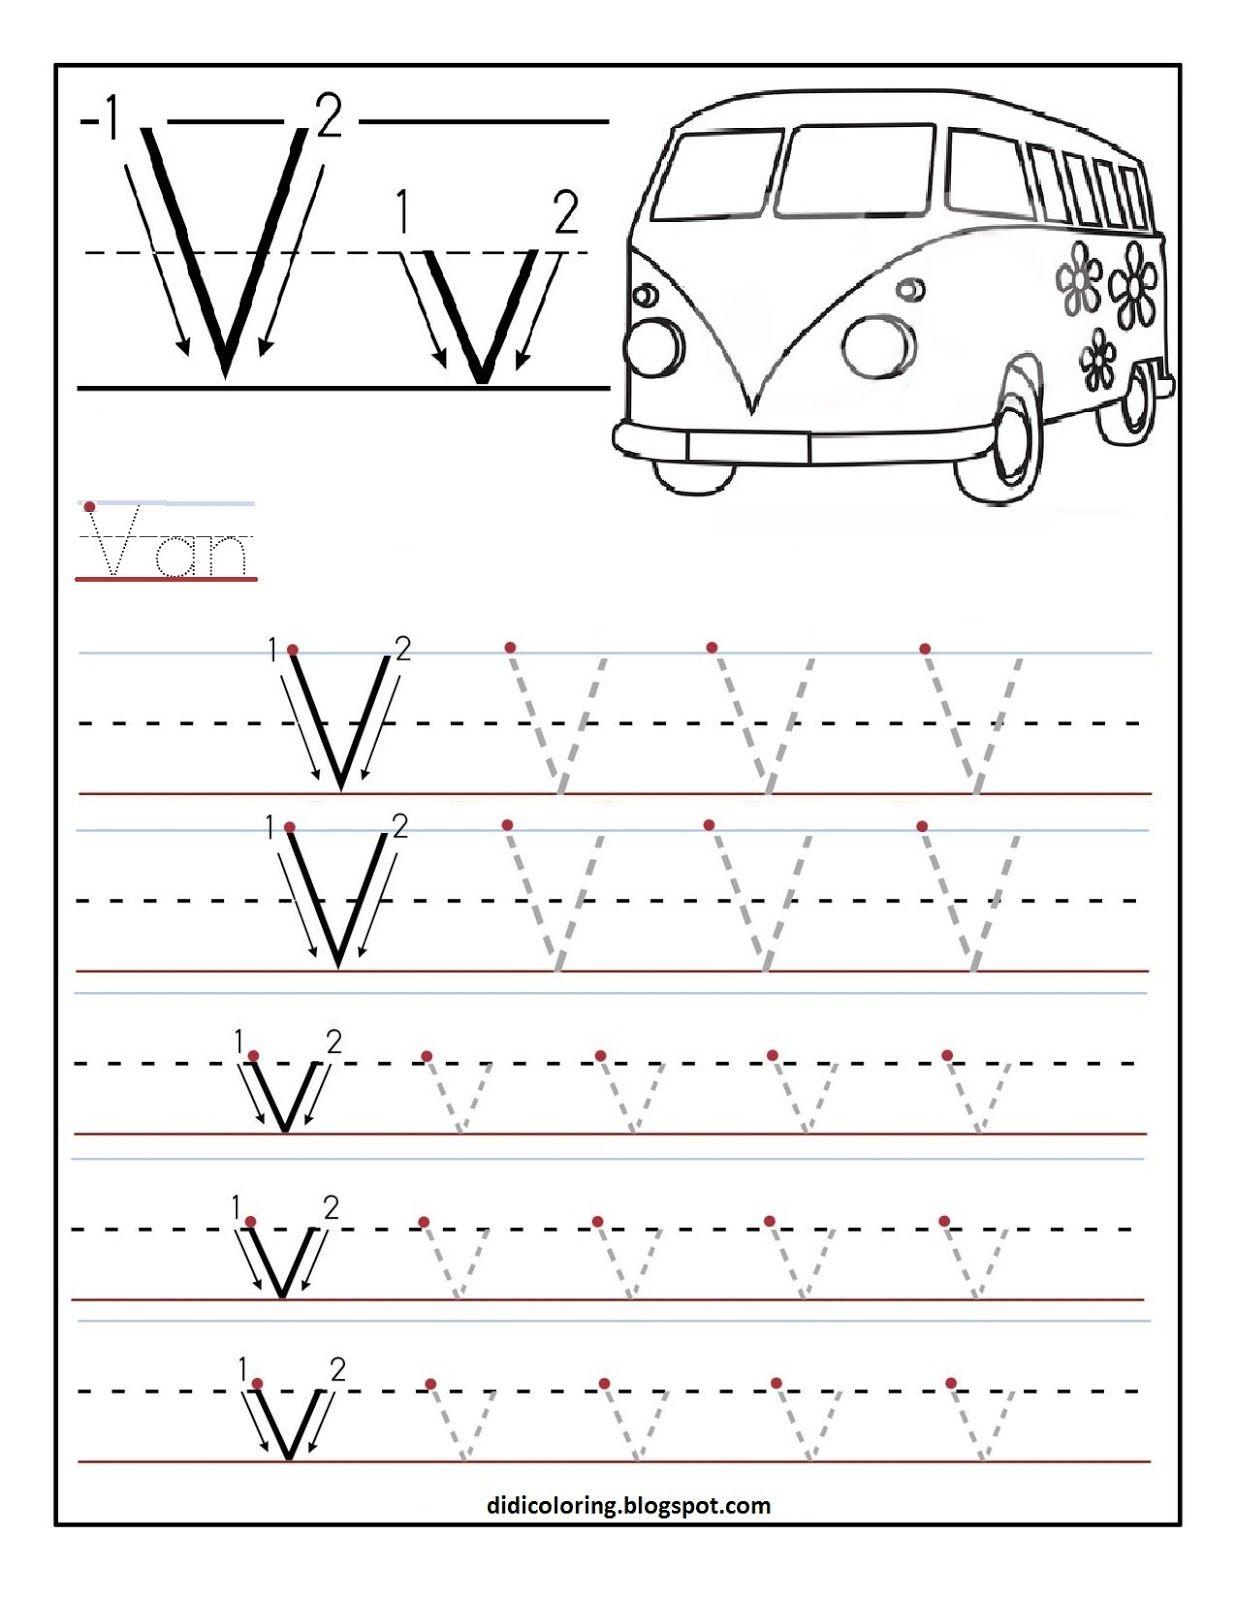 Free Printable Worksheet Letter V For Your Child To Learn within Letter V Worksheets Printable